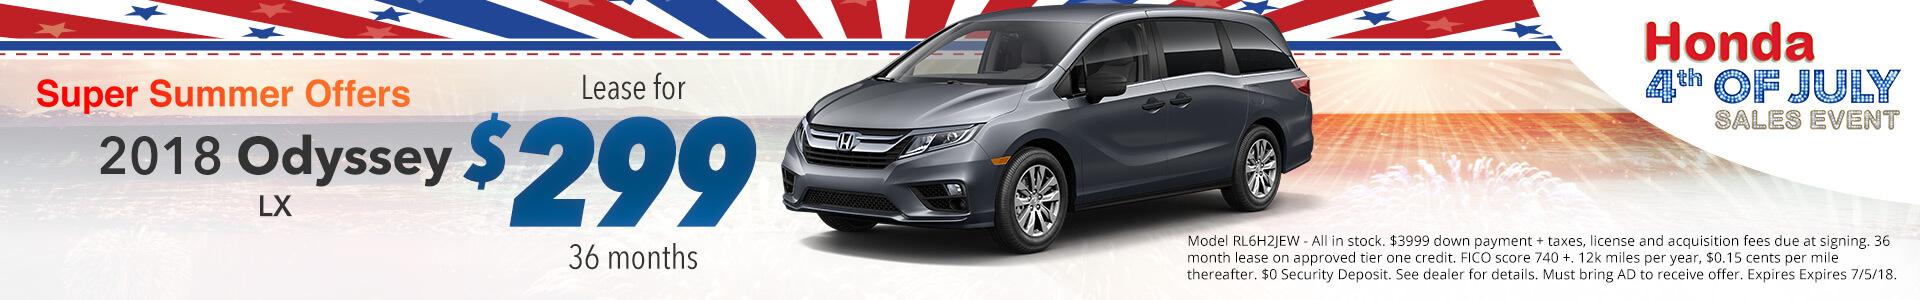 Honda Odyssey $299 Lease